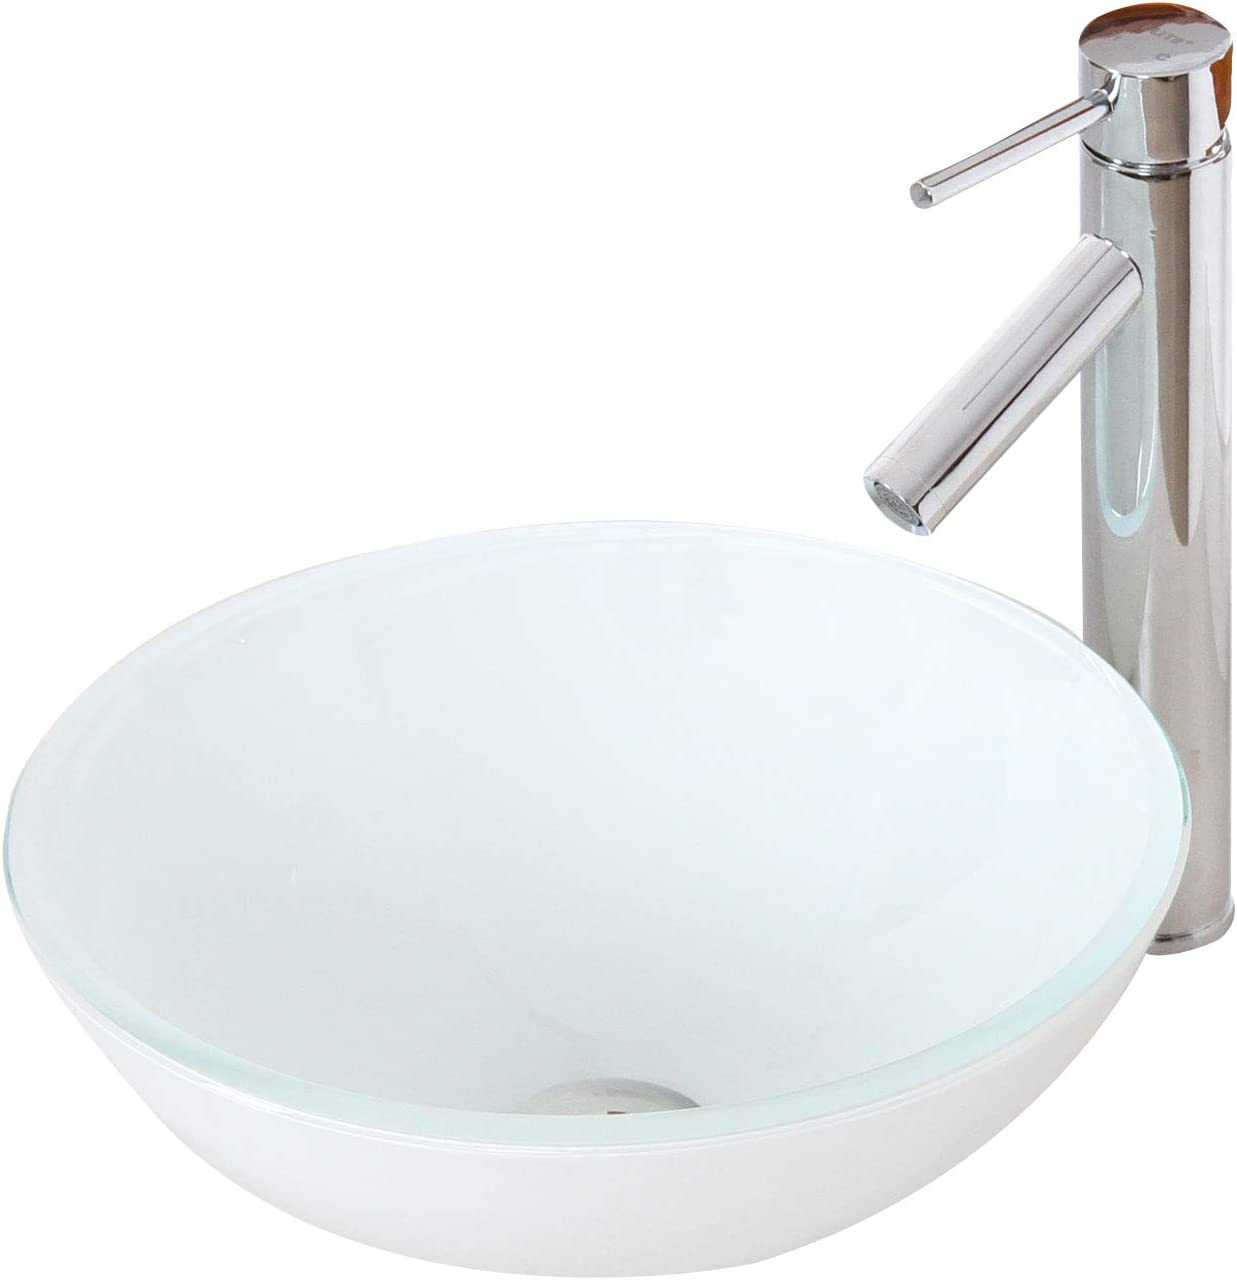 ELITE Tempered Bathroom White Pattern Glass Vessel Sink Chrome Faucet Combo